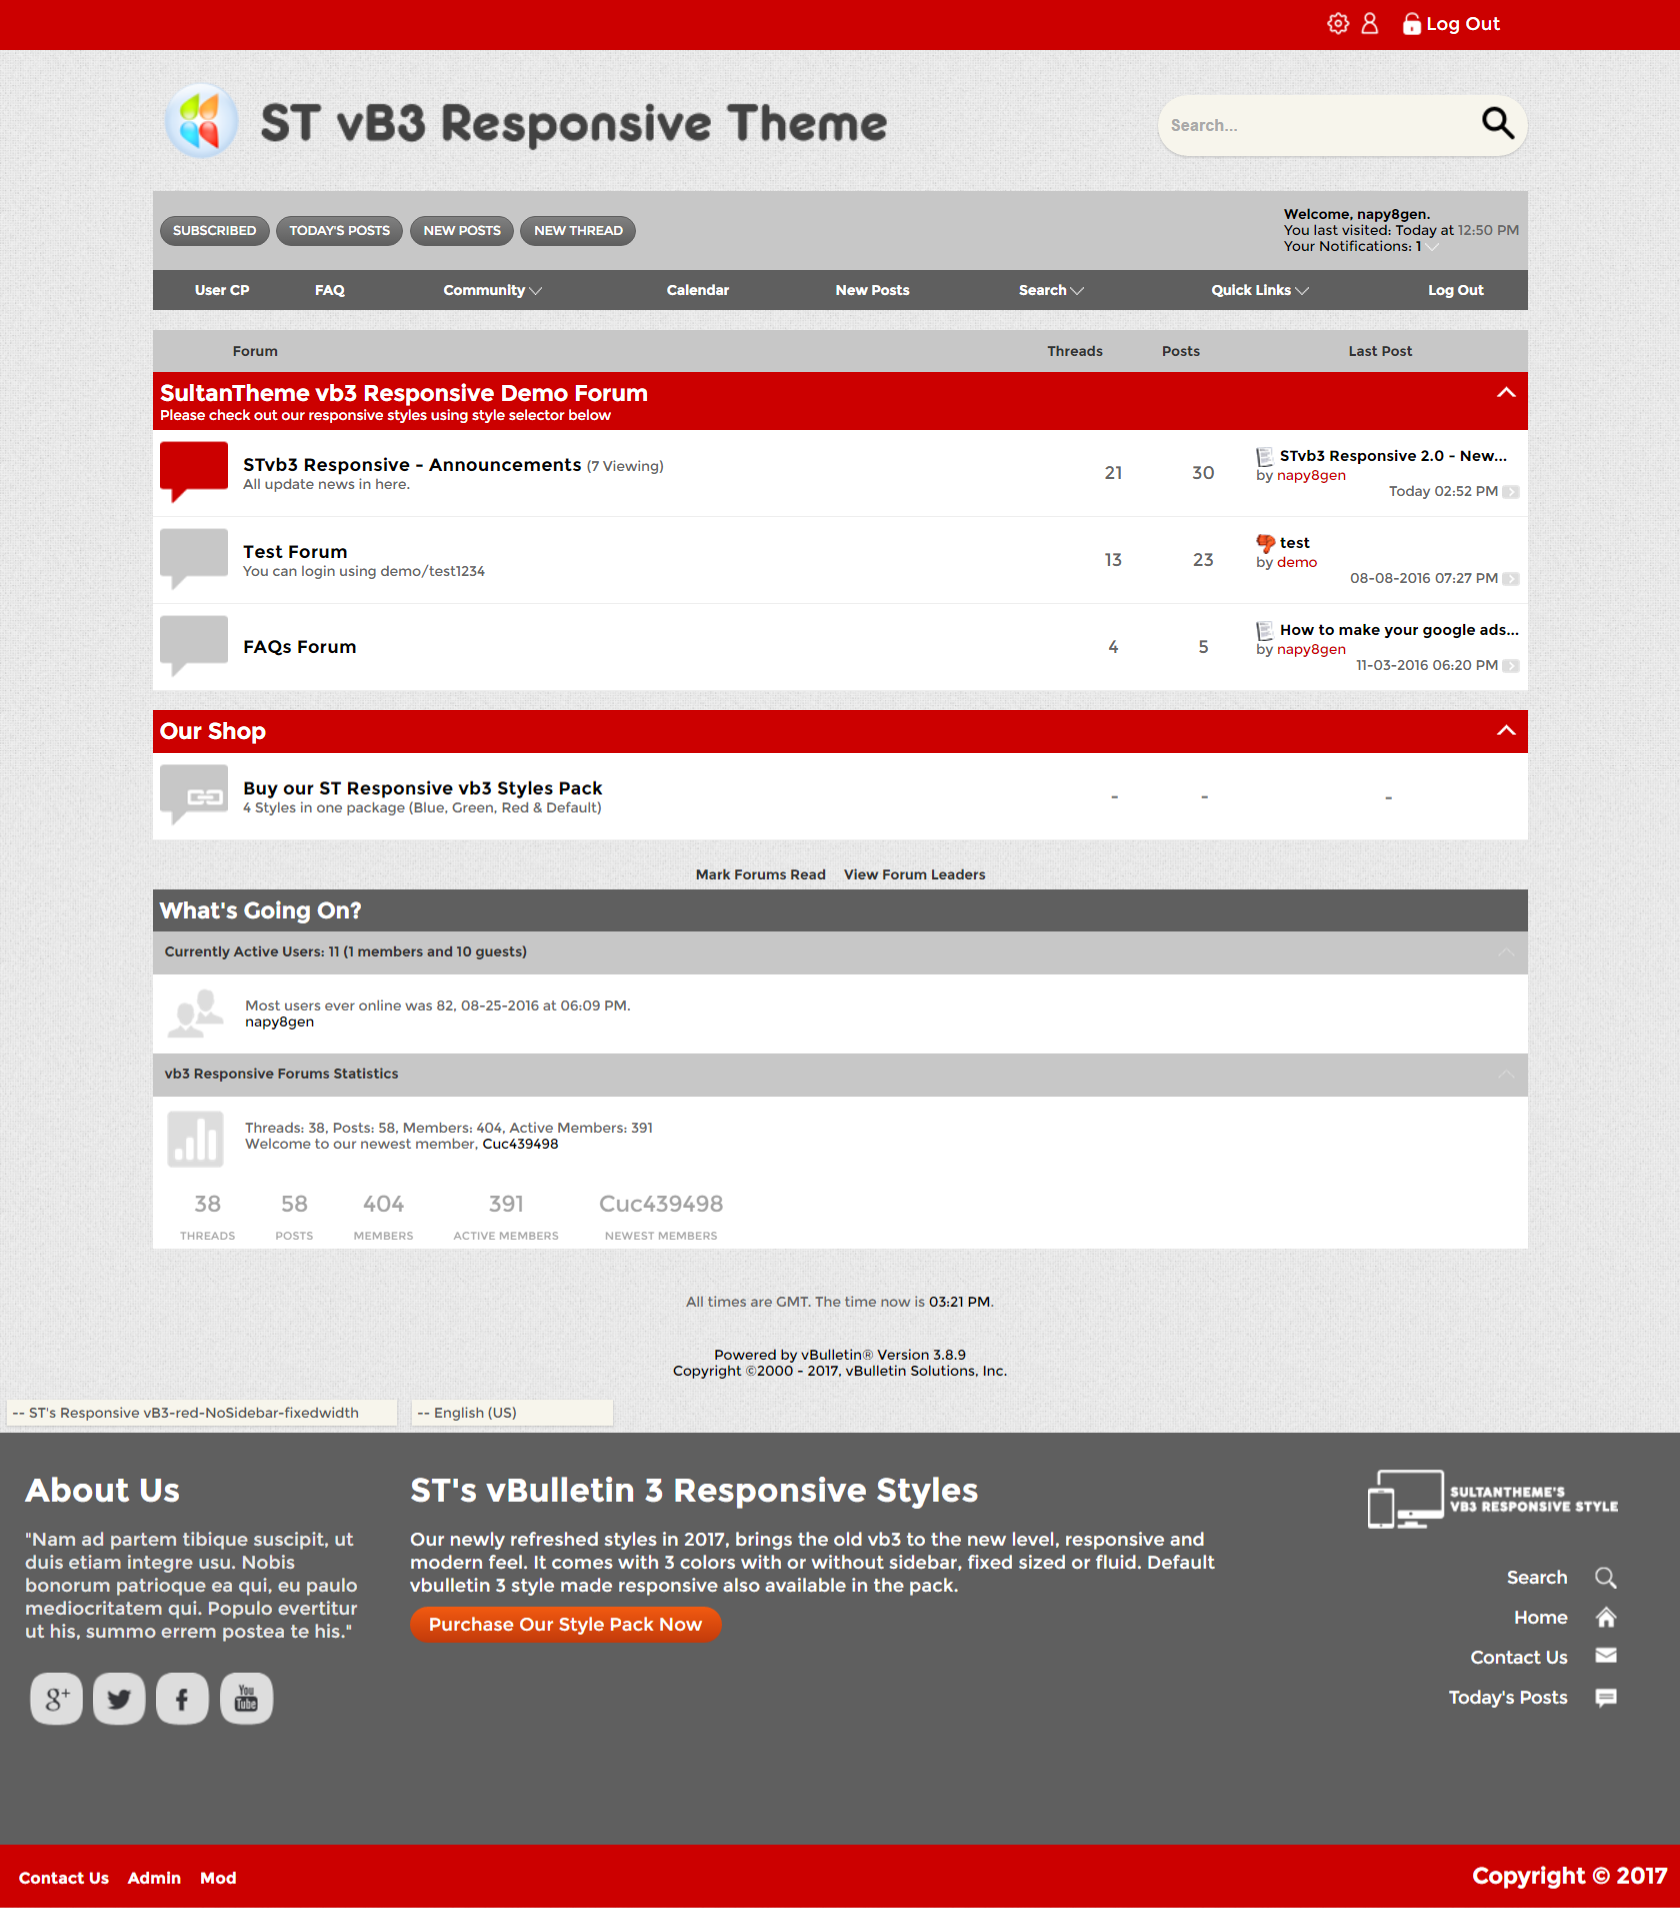 FireShot Capture 3 vb3 Responsive Forums3 - ST vb3 Responsive